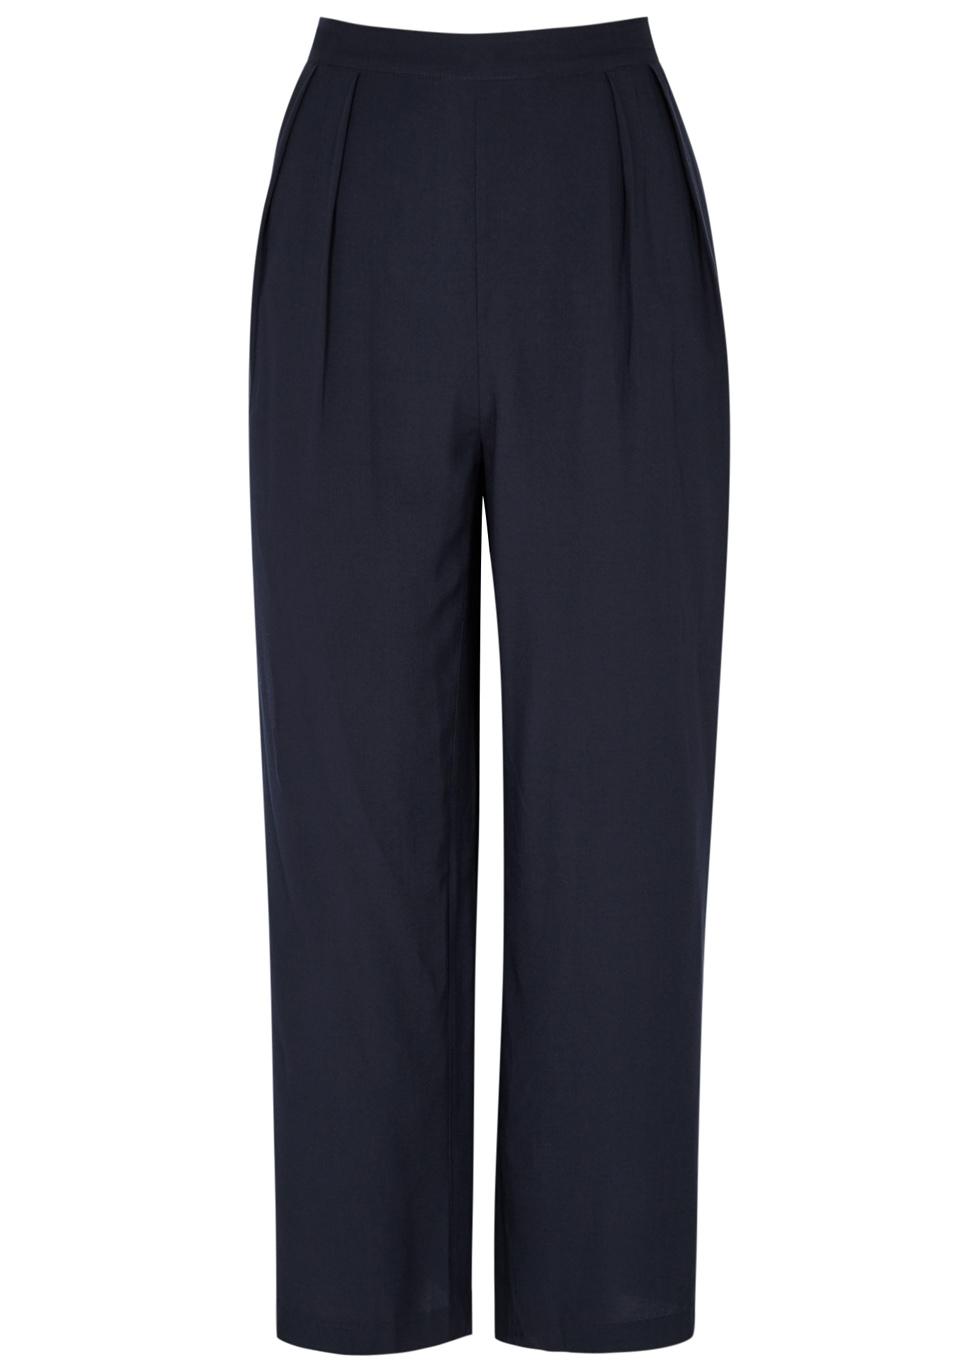 SAMS0E & SAMS0E Ganda Wide-Leg Jersey Trousers in Navy